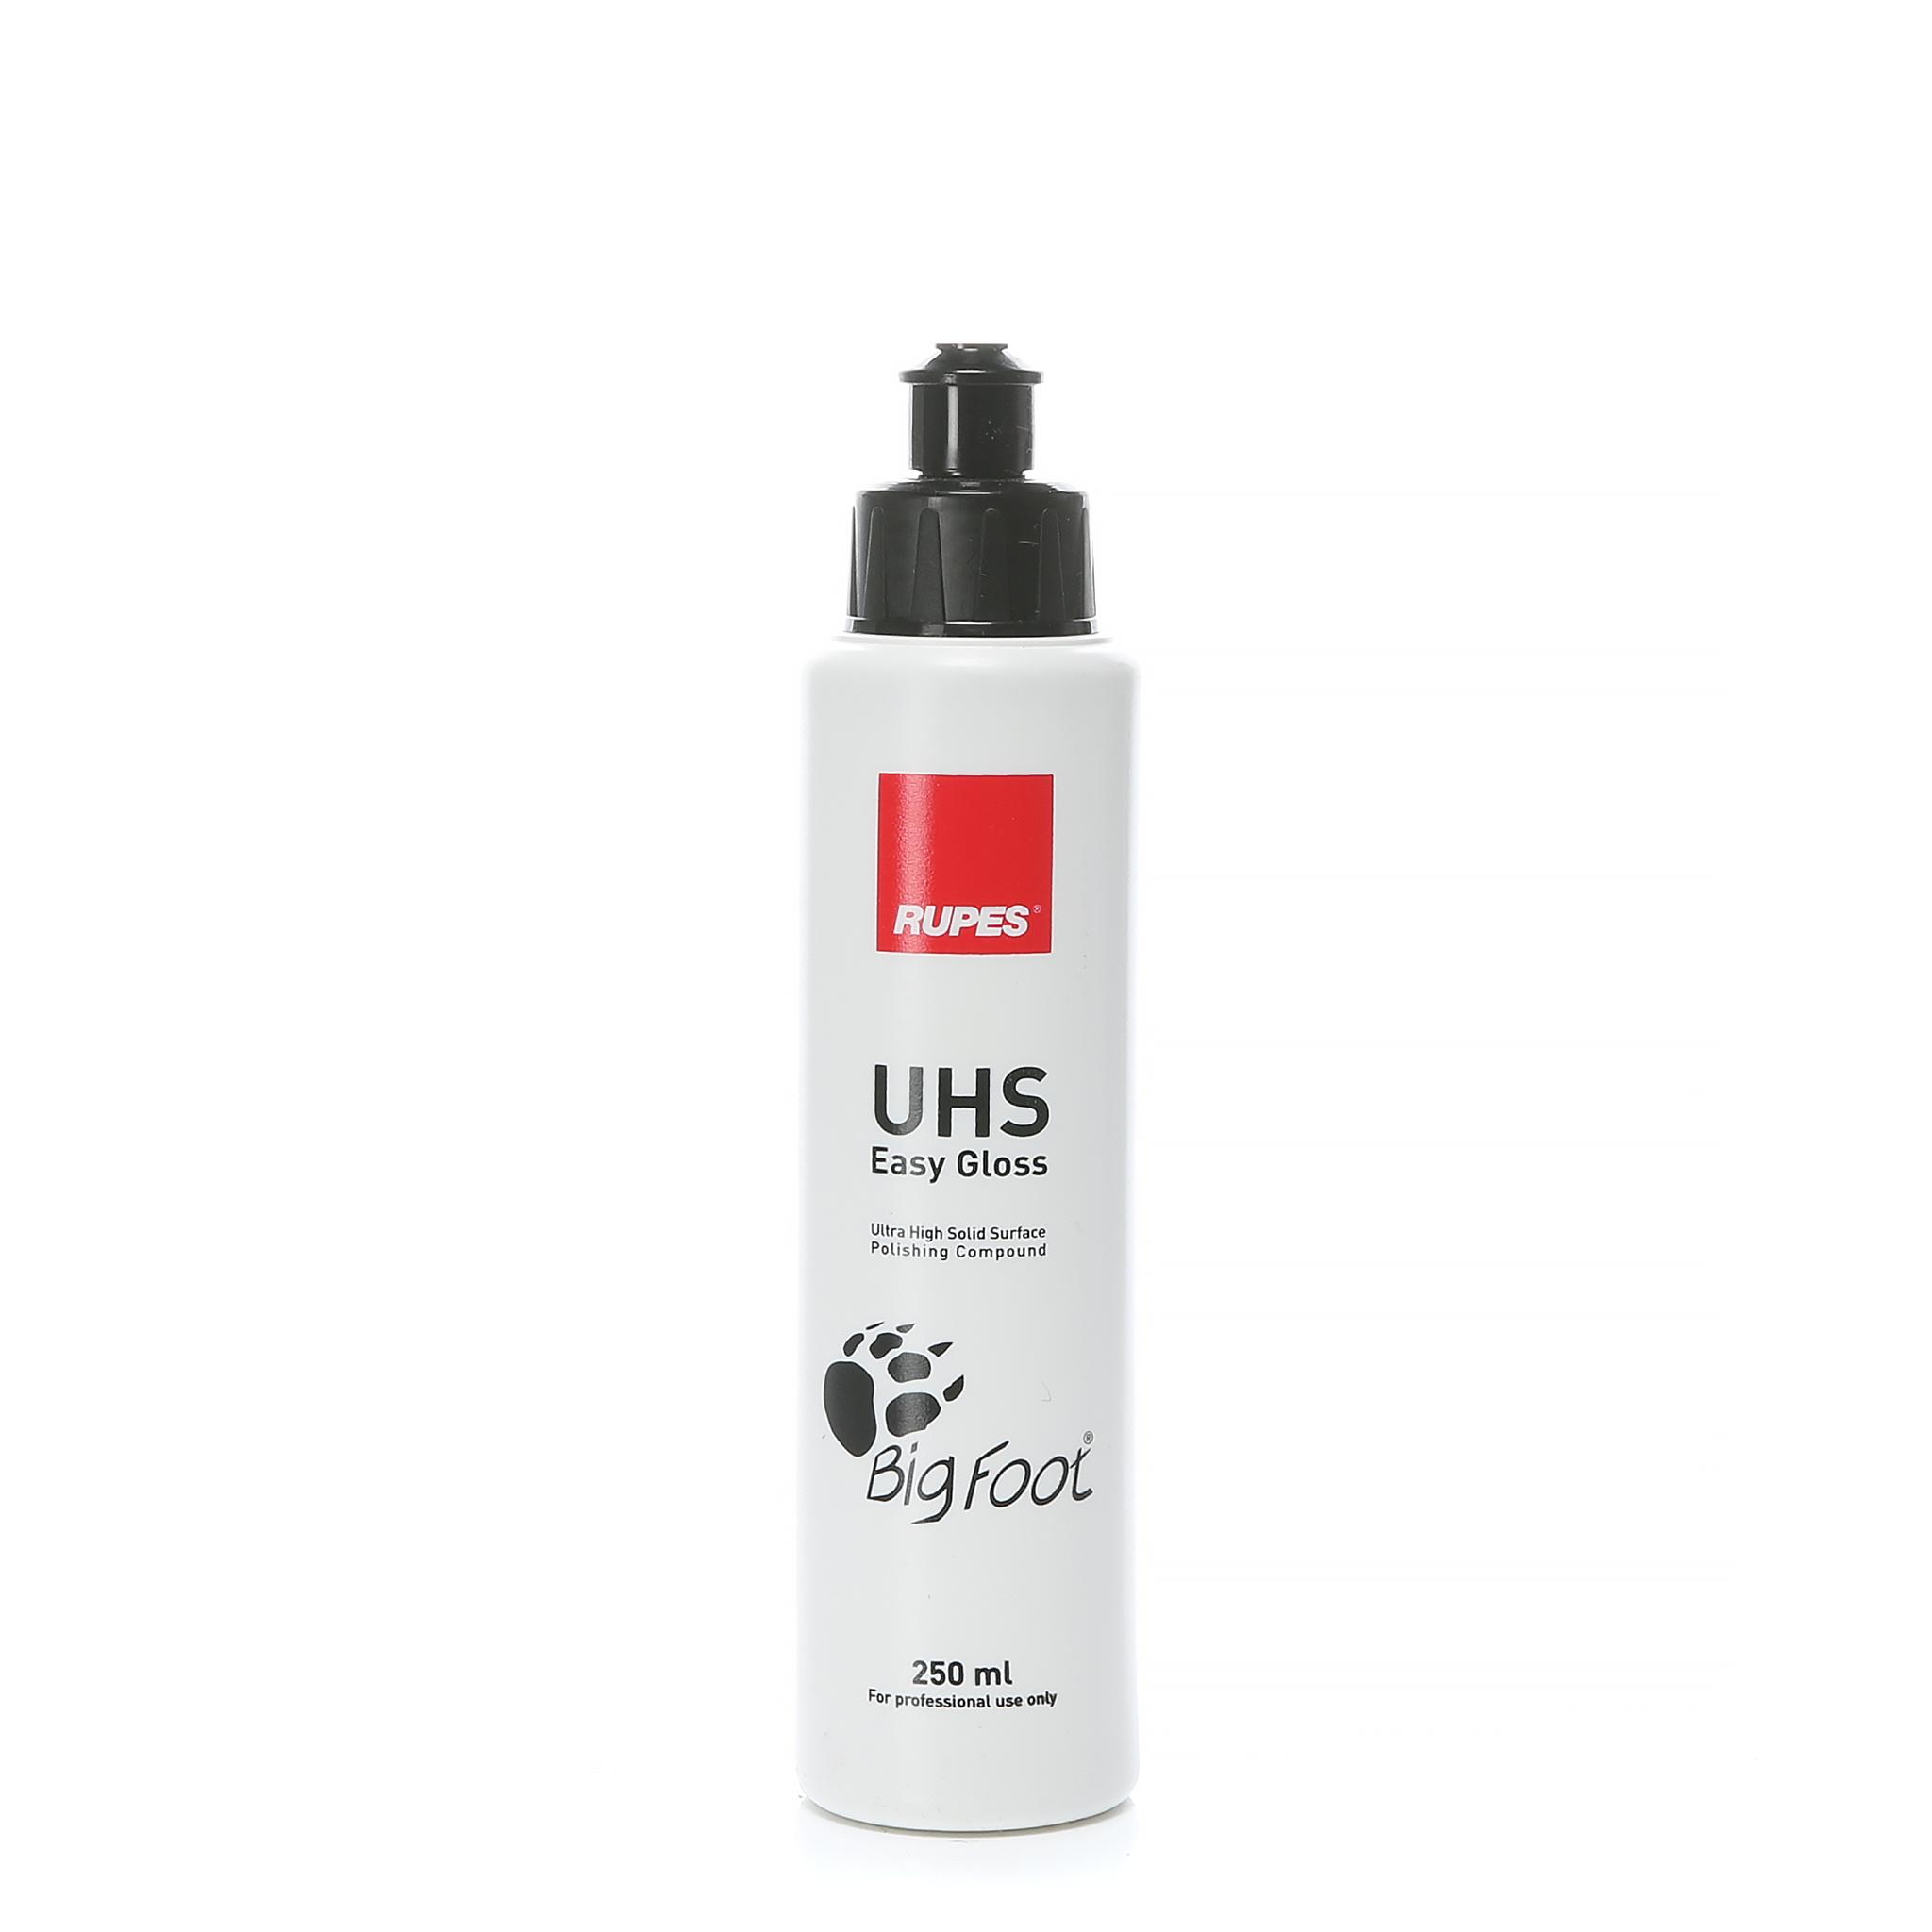 Polermedel Rupes UHS Easy Gloss, 250 ml